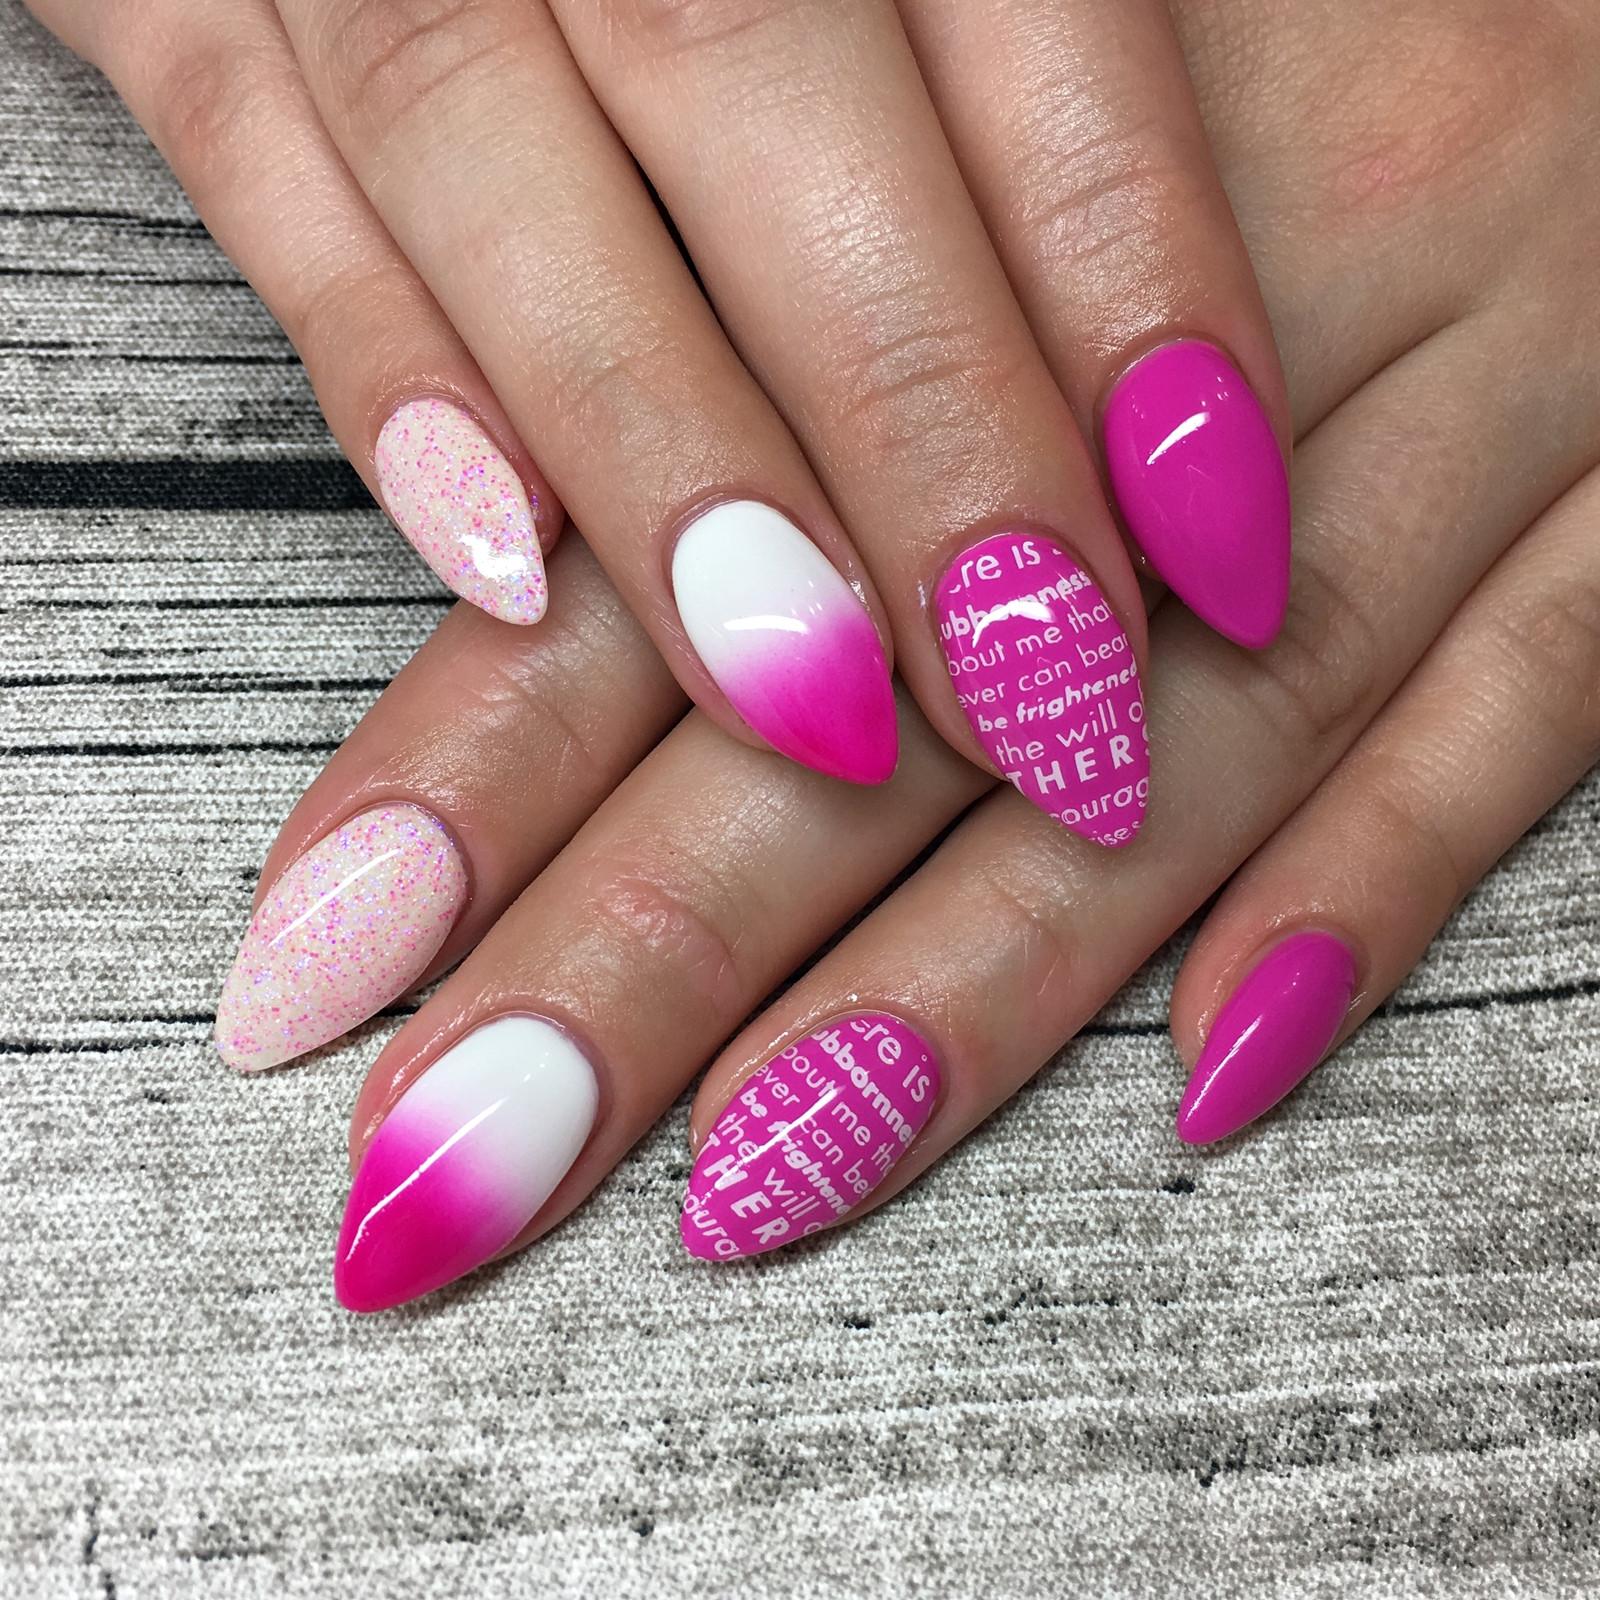 Nageldesign Schrift  Nail Art Inspiration 2 Fashionladyloves